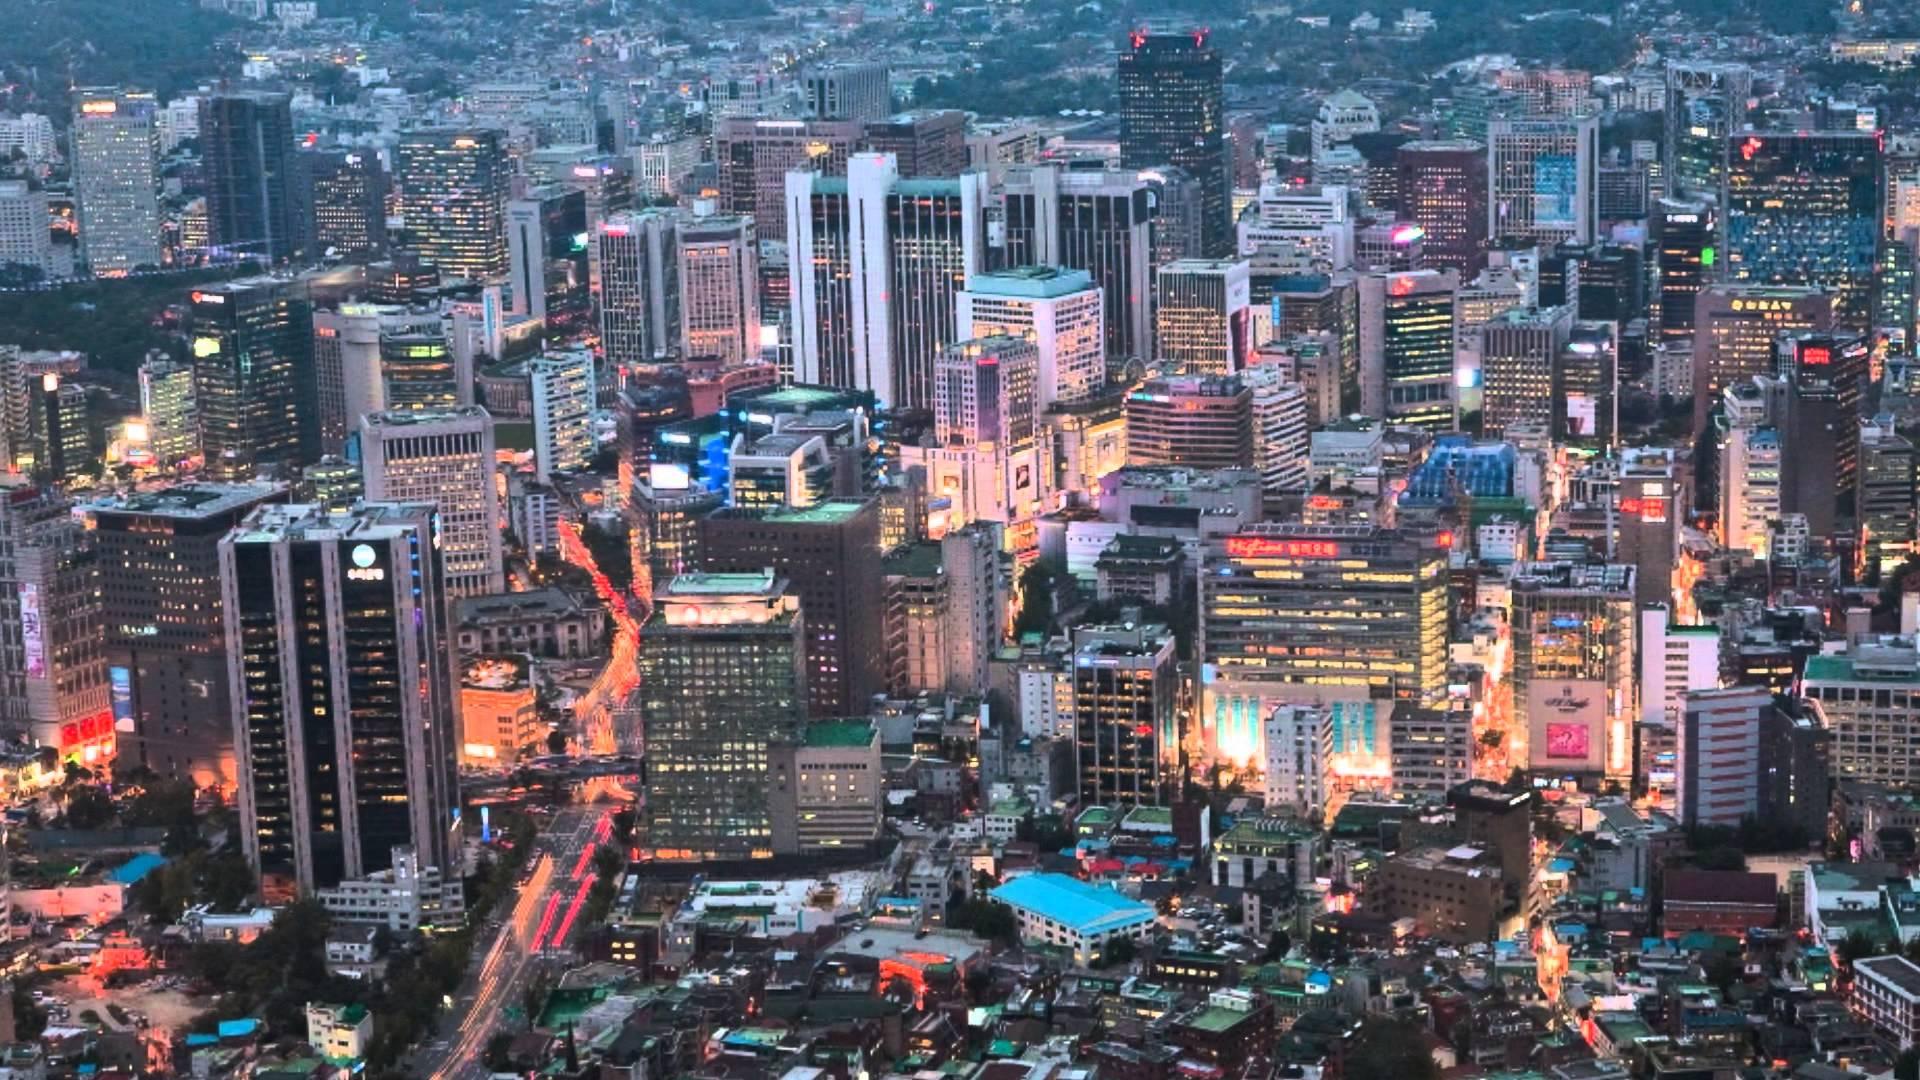 Image of Seoul